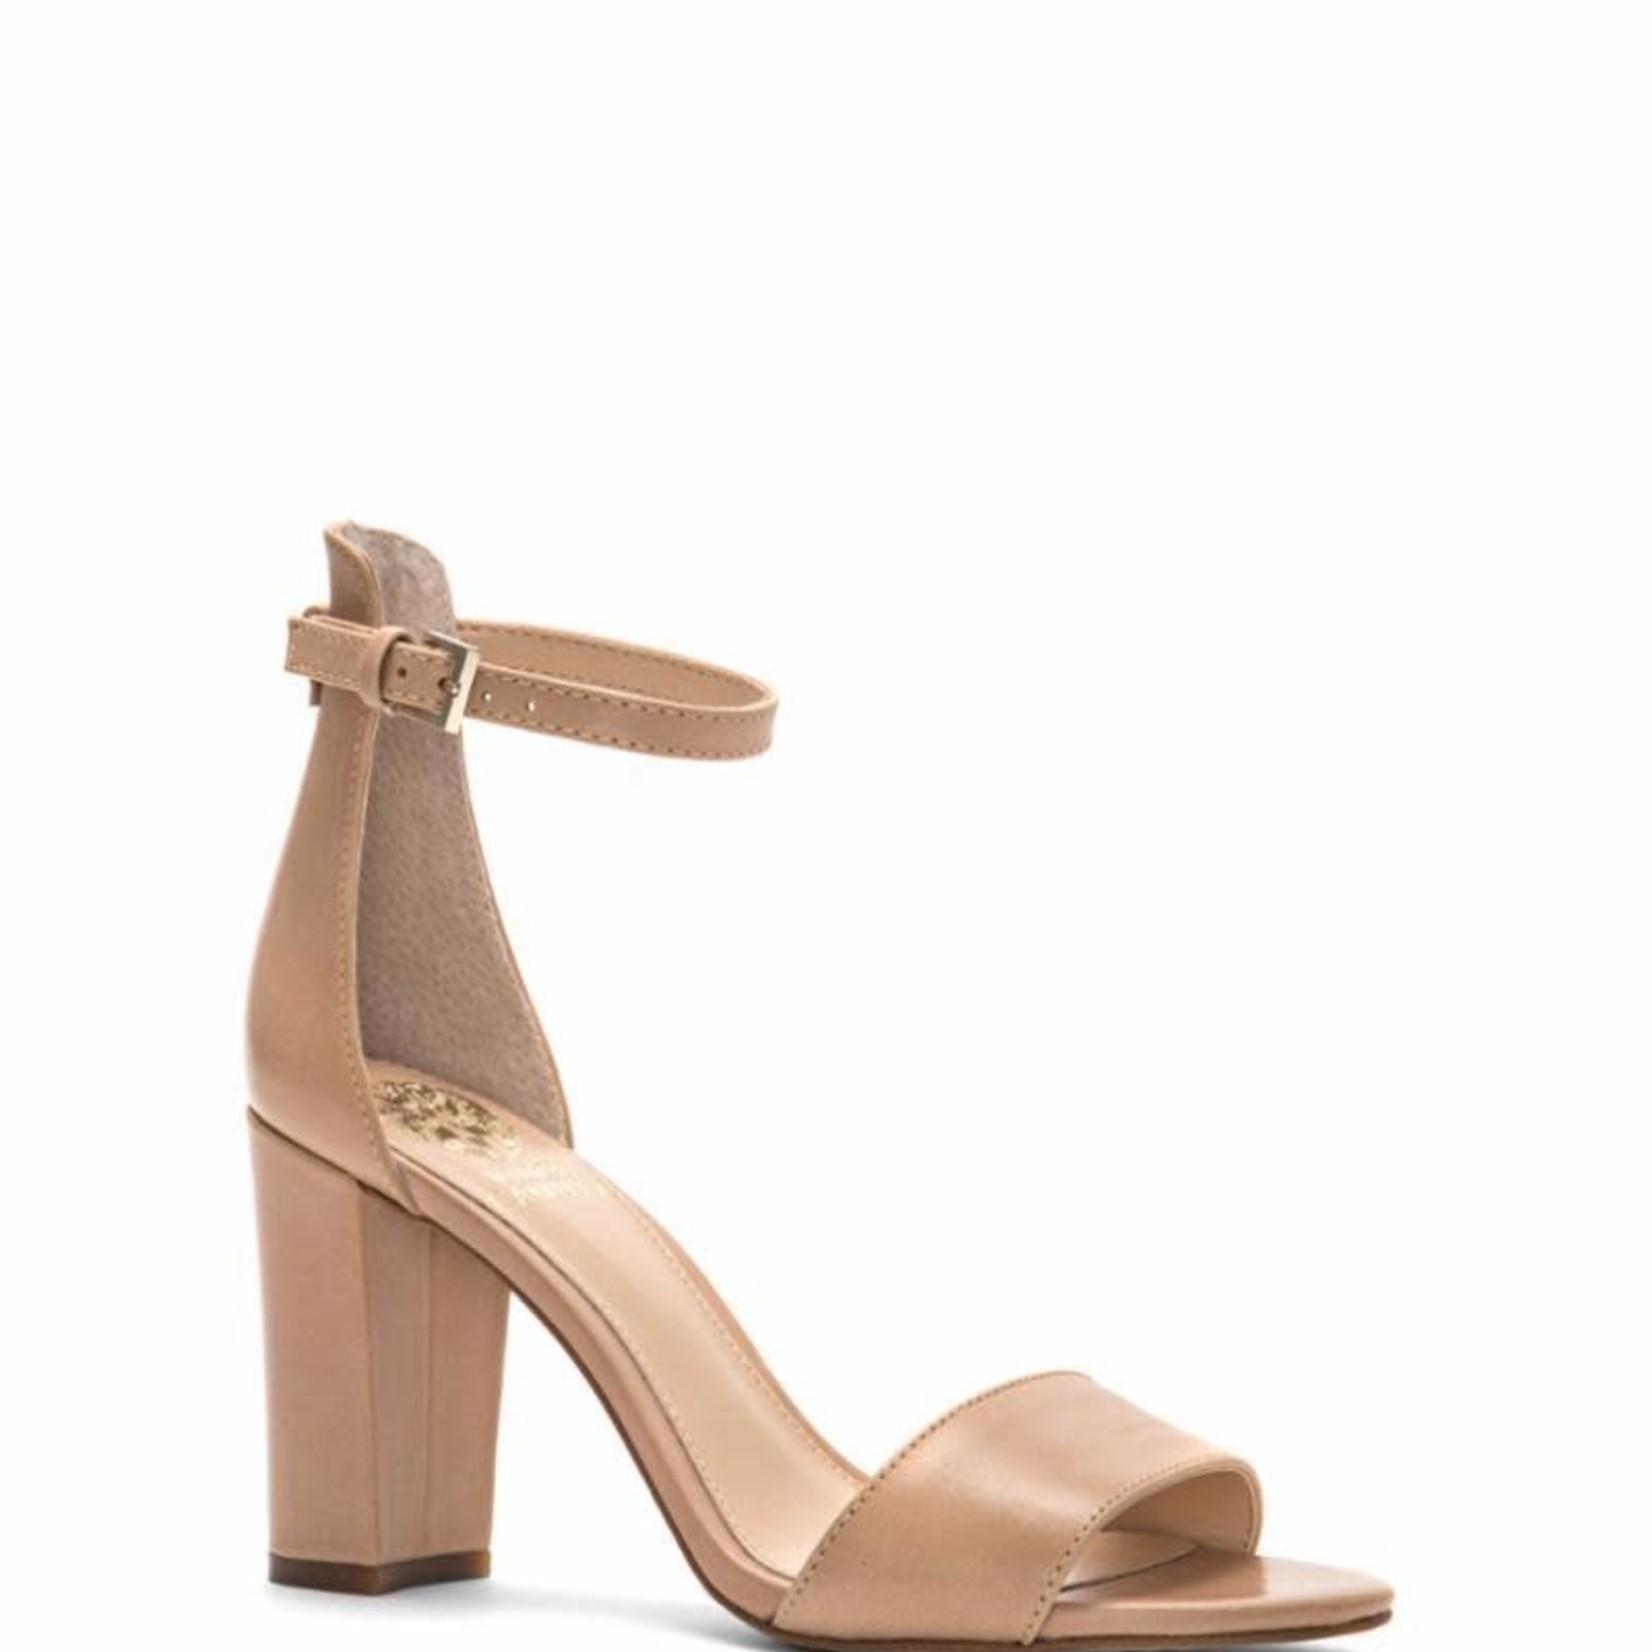 Vince Camuto Corlina Block Heel Sandal